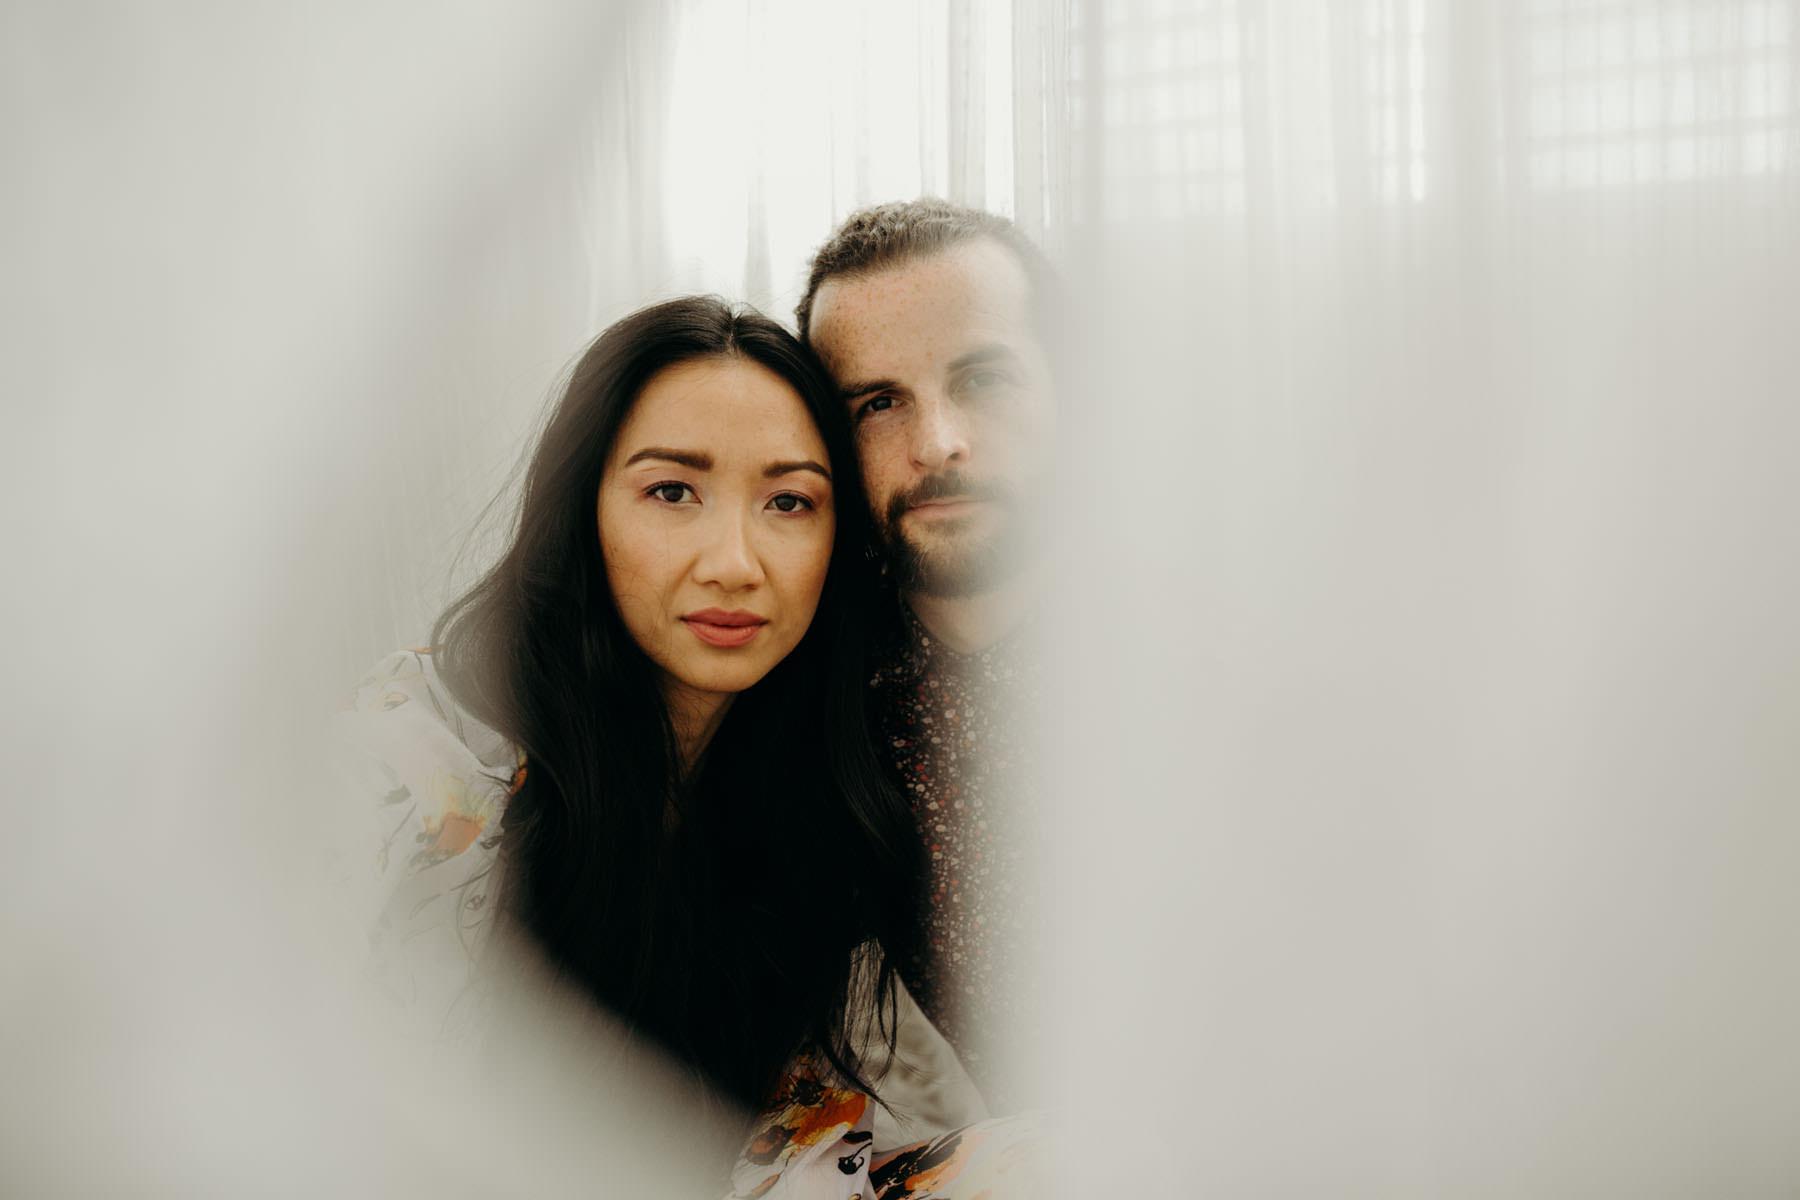 white sheets at home photo shoot inspiration